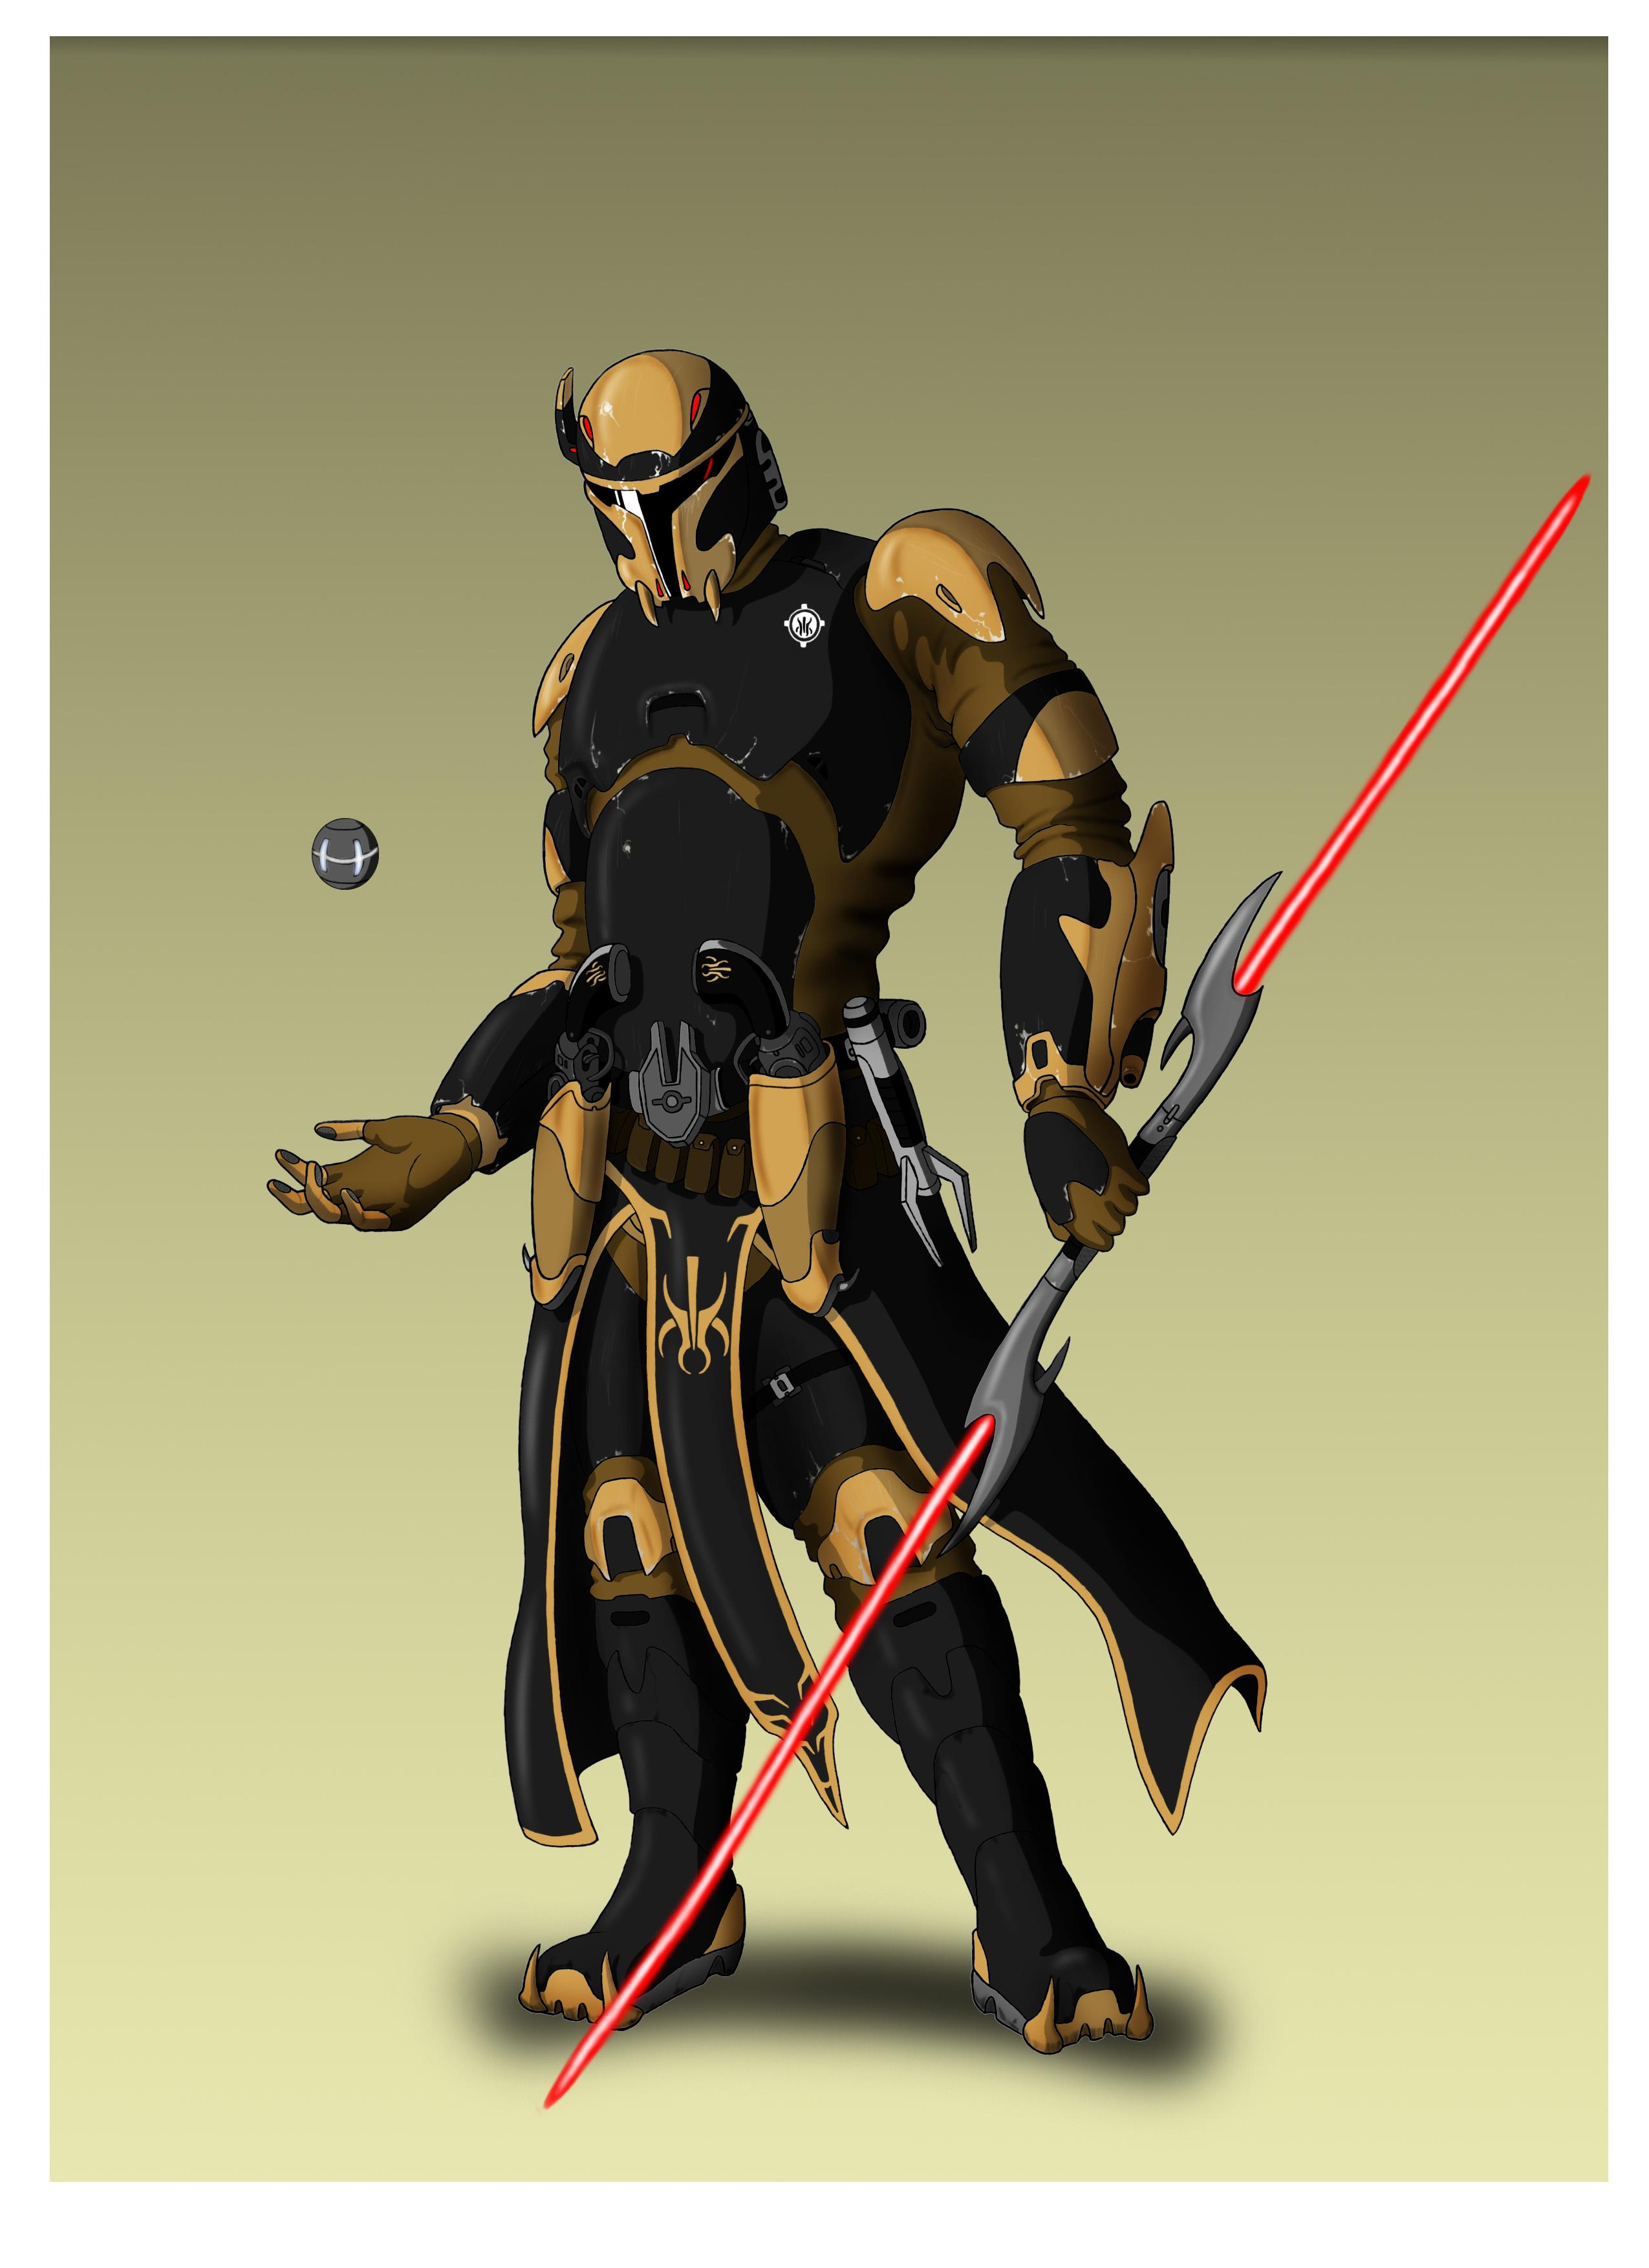 Madalorian sith armor